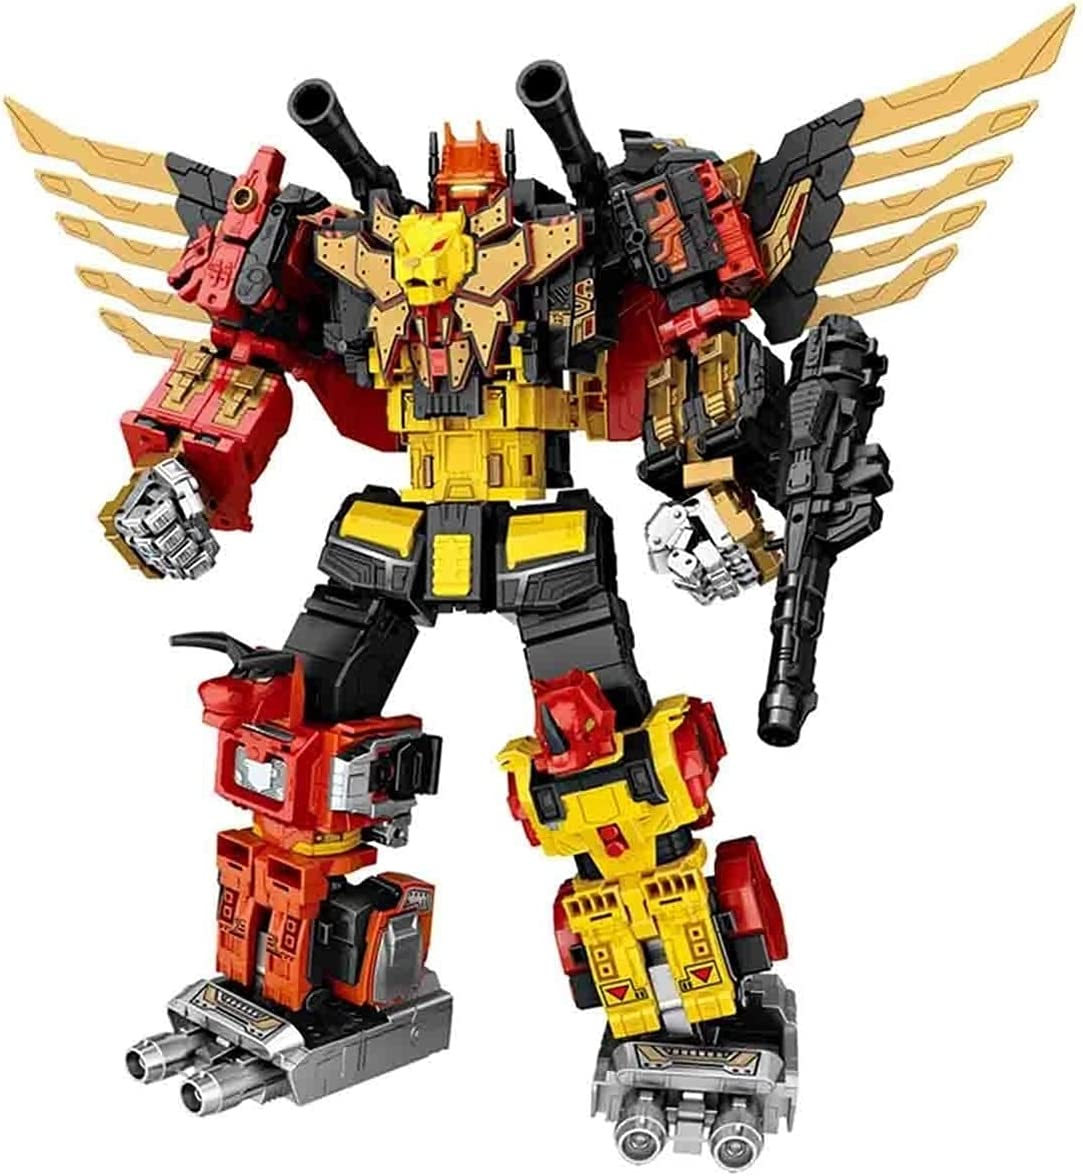 WJYLM Robot Transformer KO Transformers Award-winning store Rushing Toy into Sk The Department store